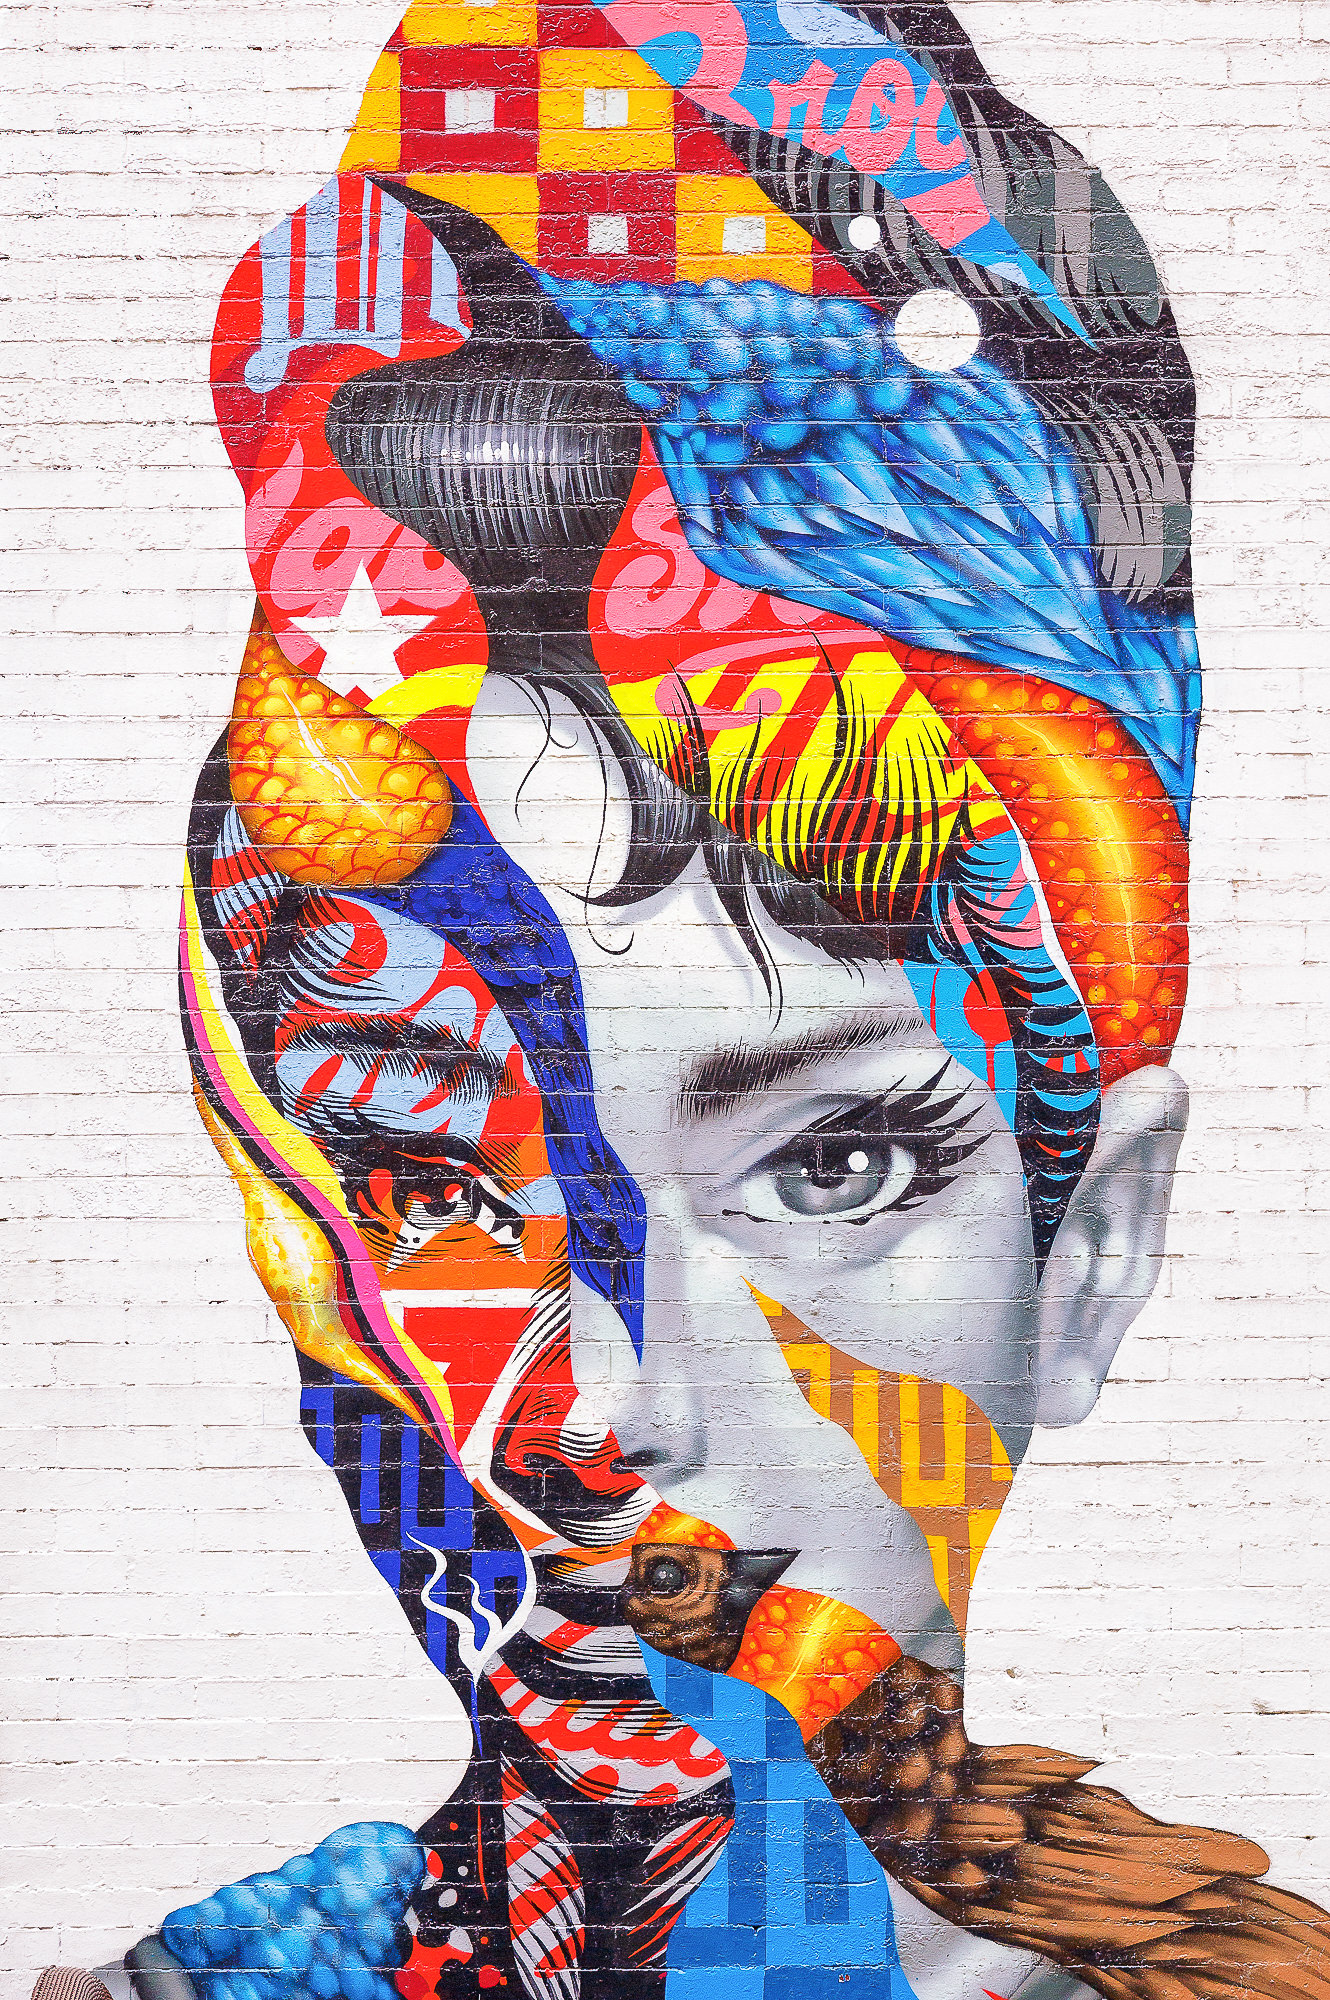 graffiti street art - New York